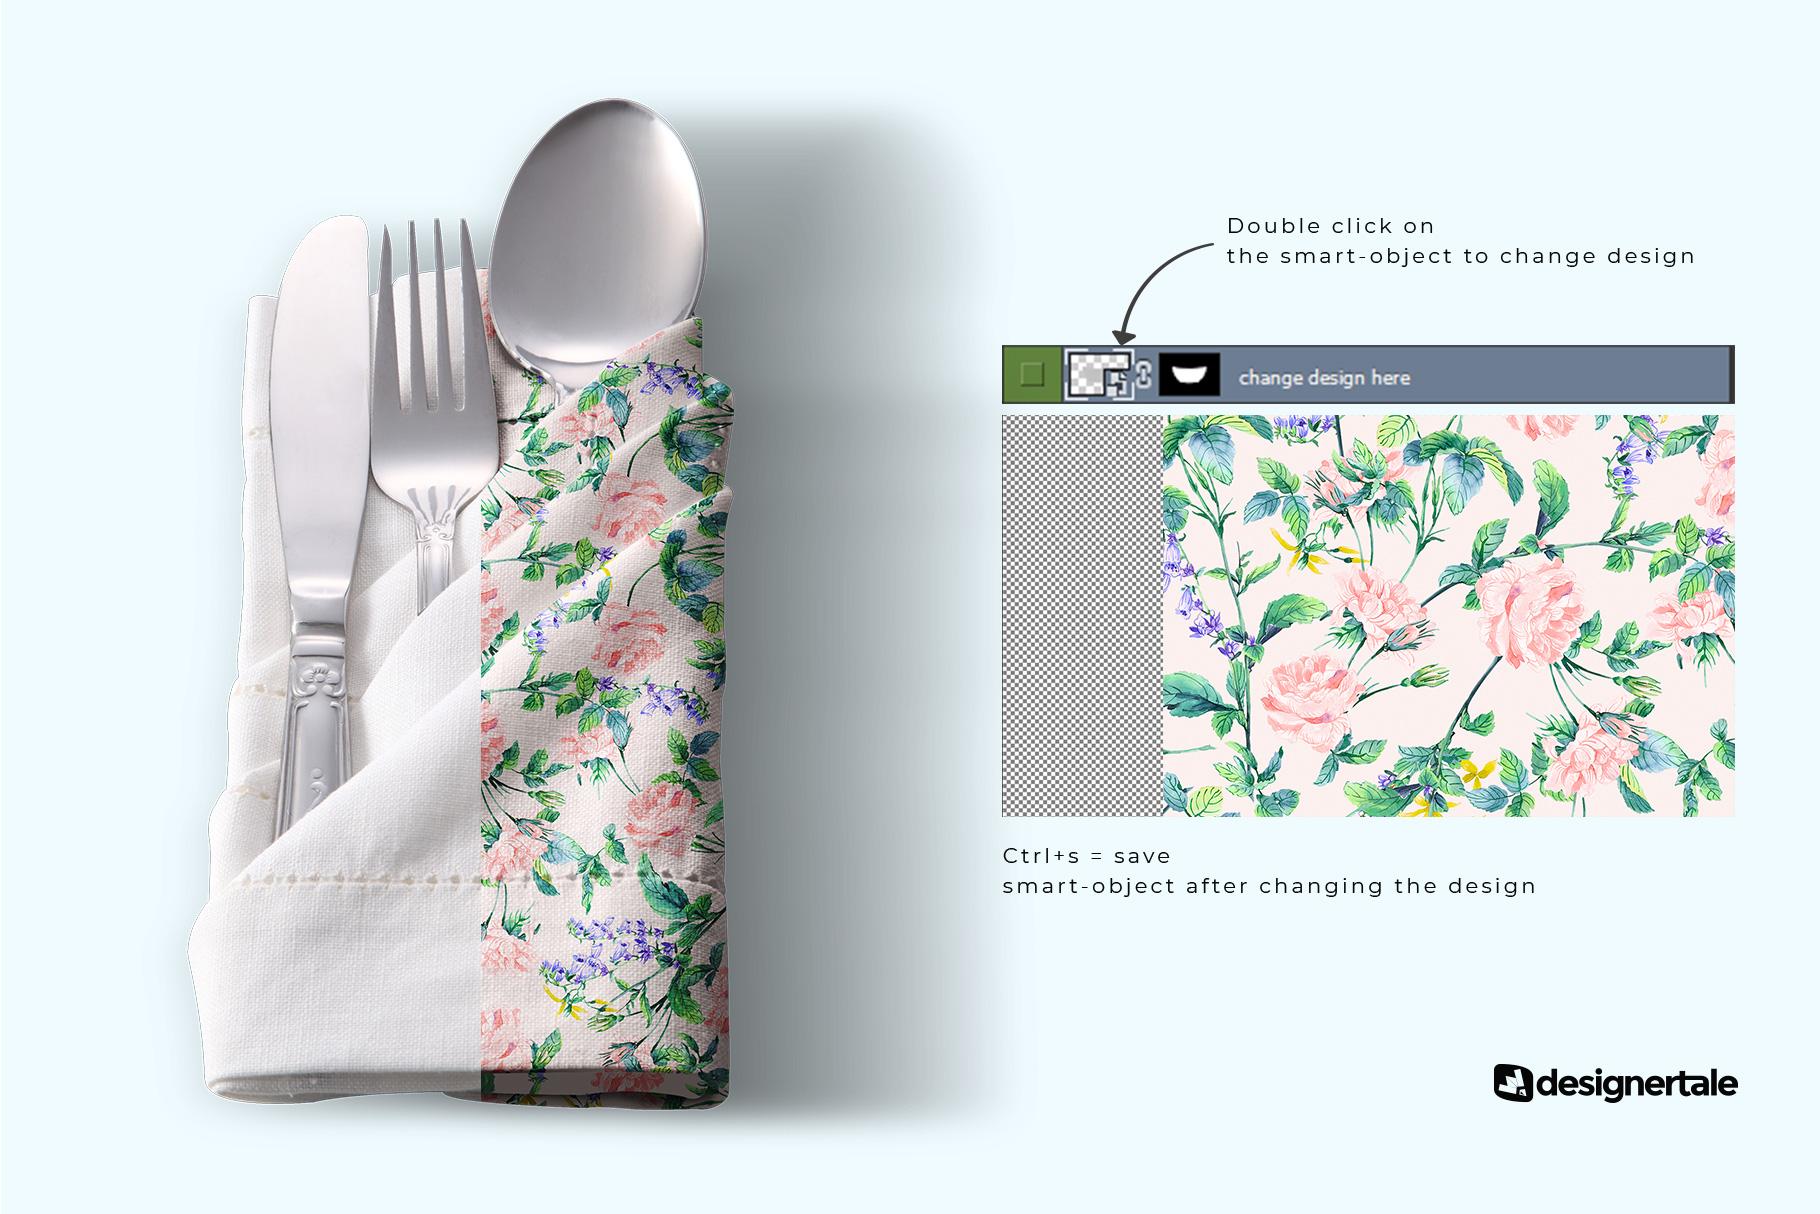 change design of the folded napkin with utensils mockup